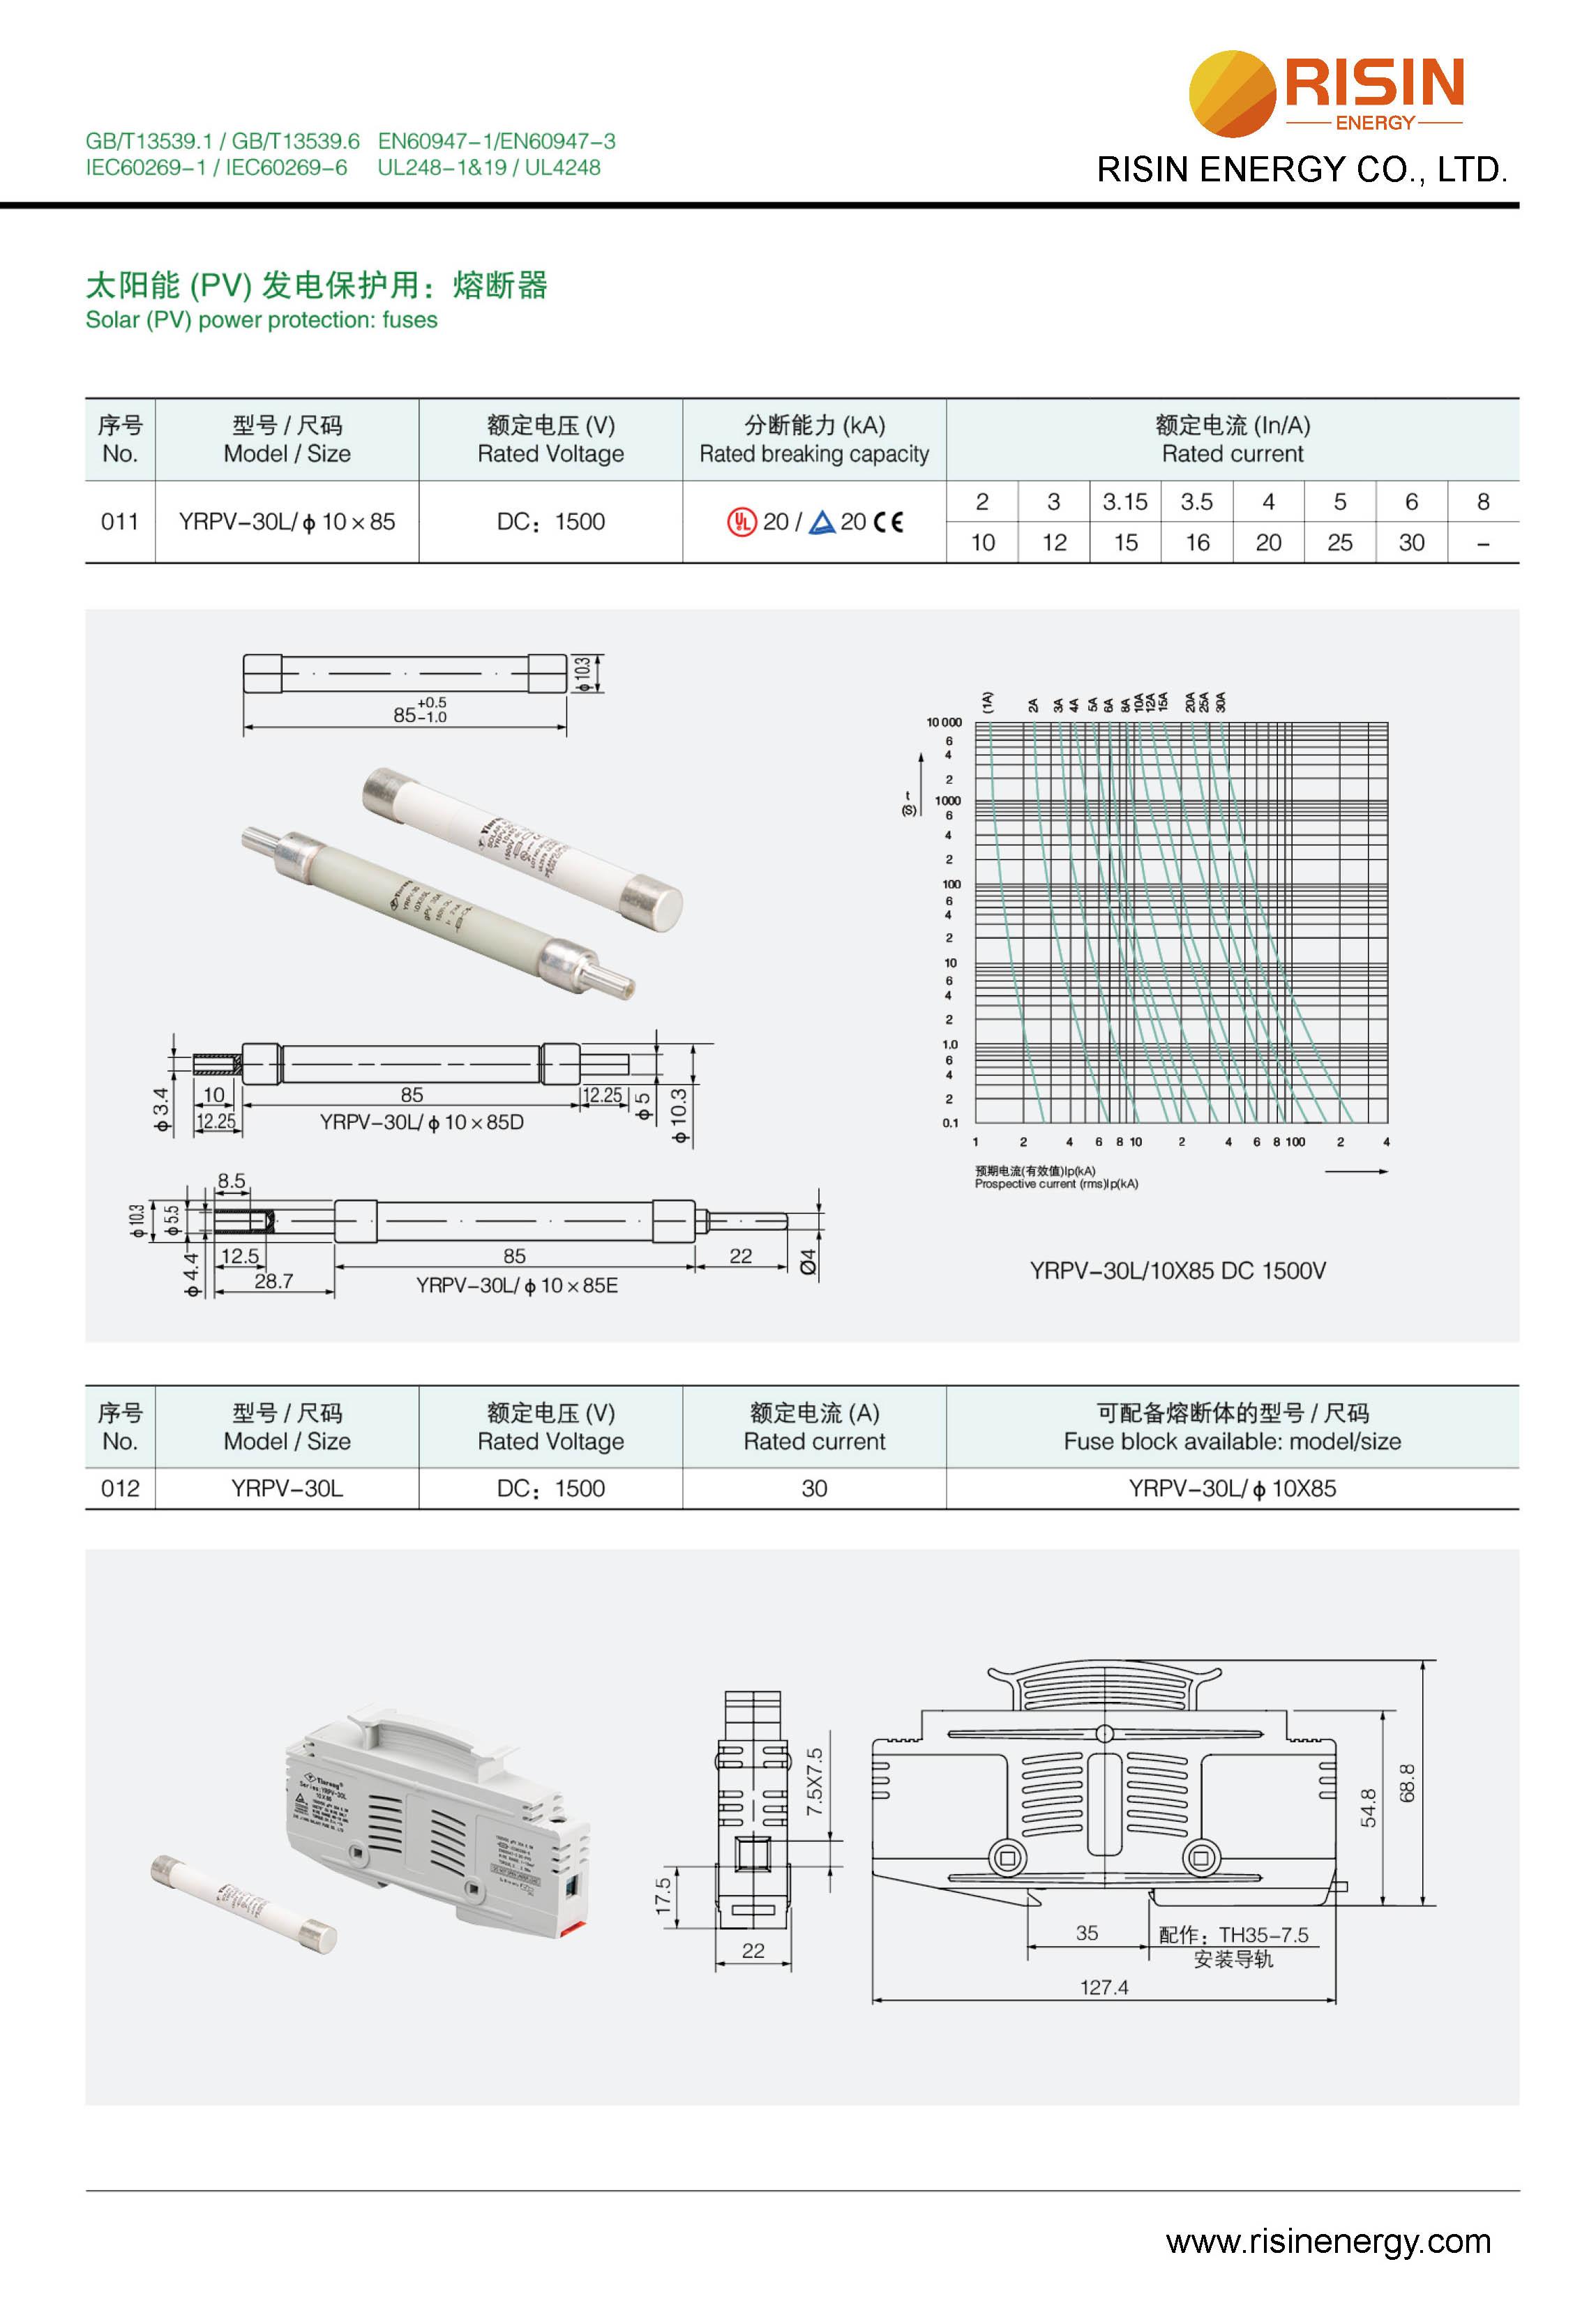 10x85mm 1500V Solar Fuse and Holder